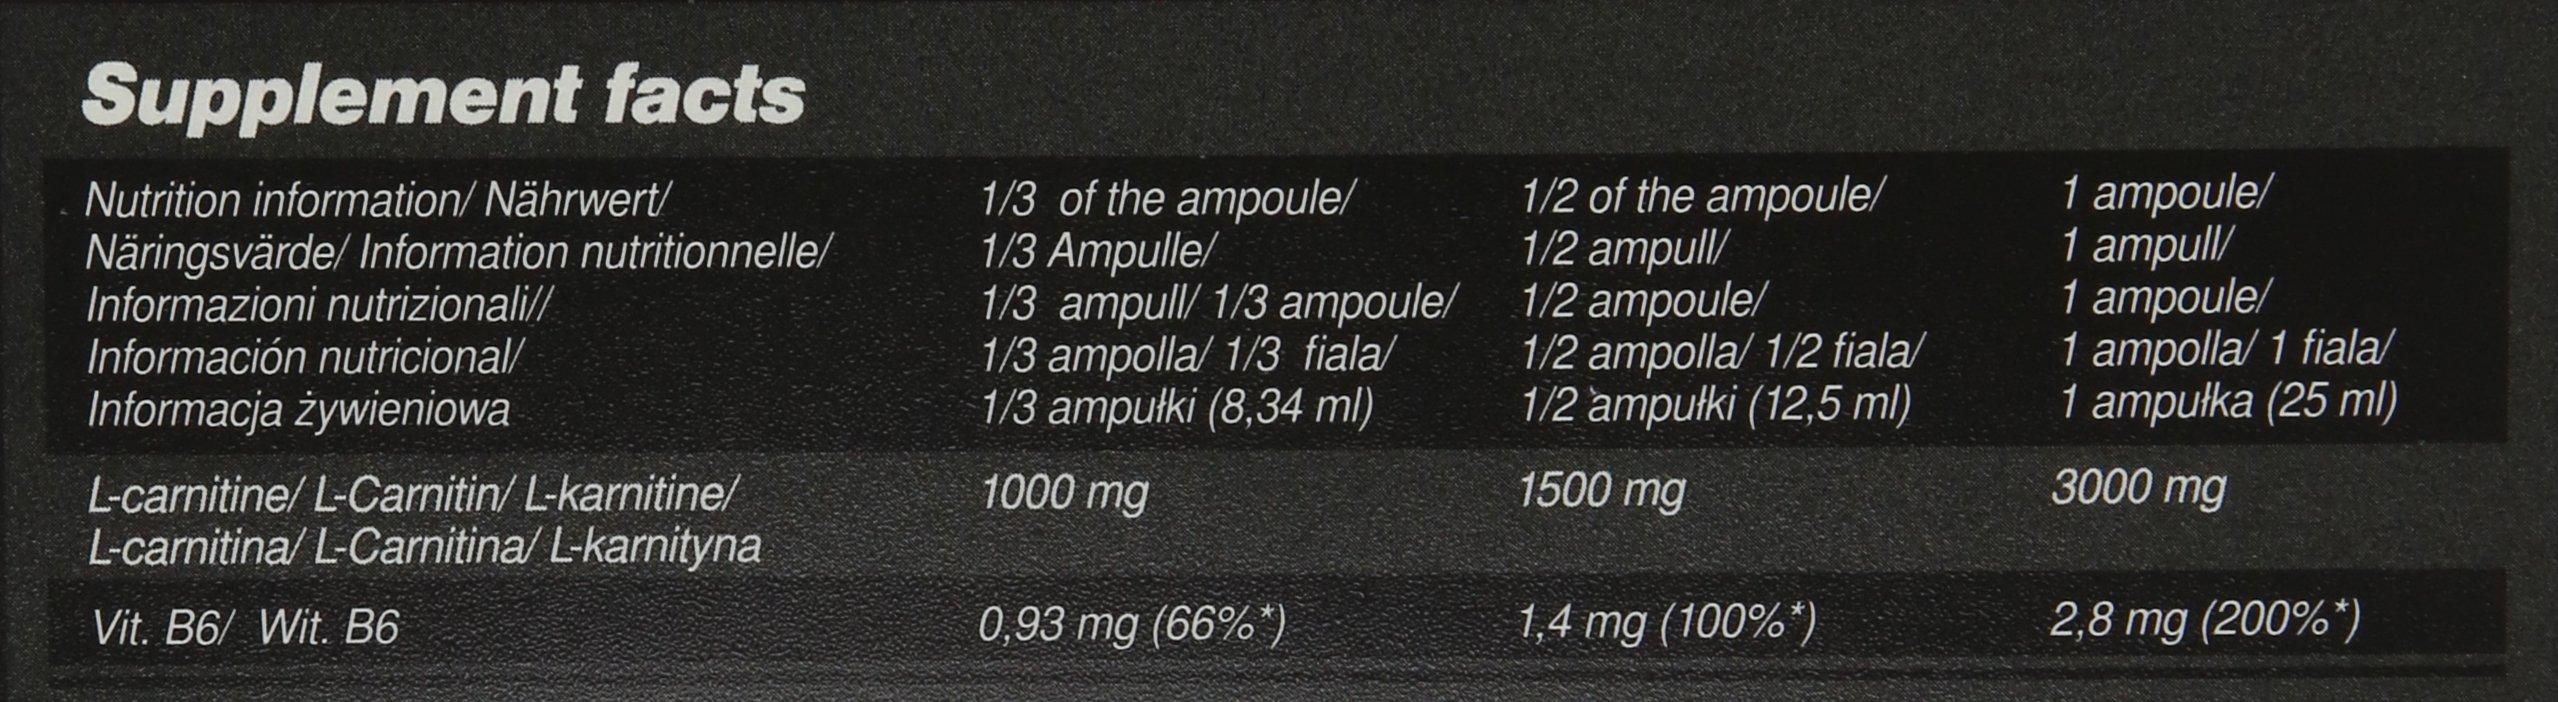 81pc 89a6XL - Olimp Orange 25ml L-Carnitine Forte 3000 Extreme Shot - Pack of 20 Shots